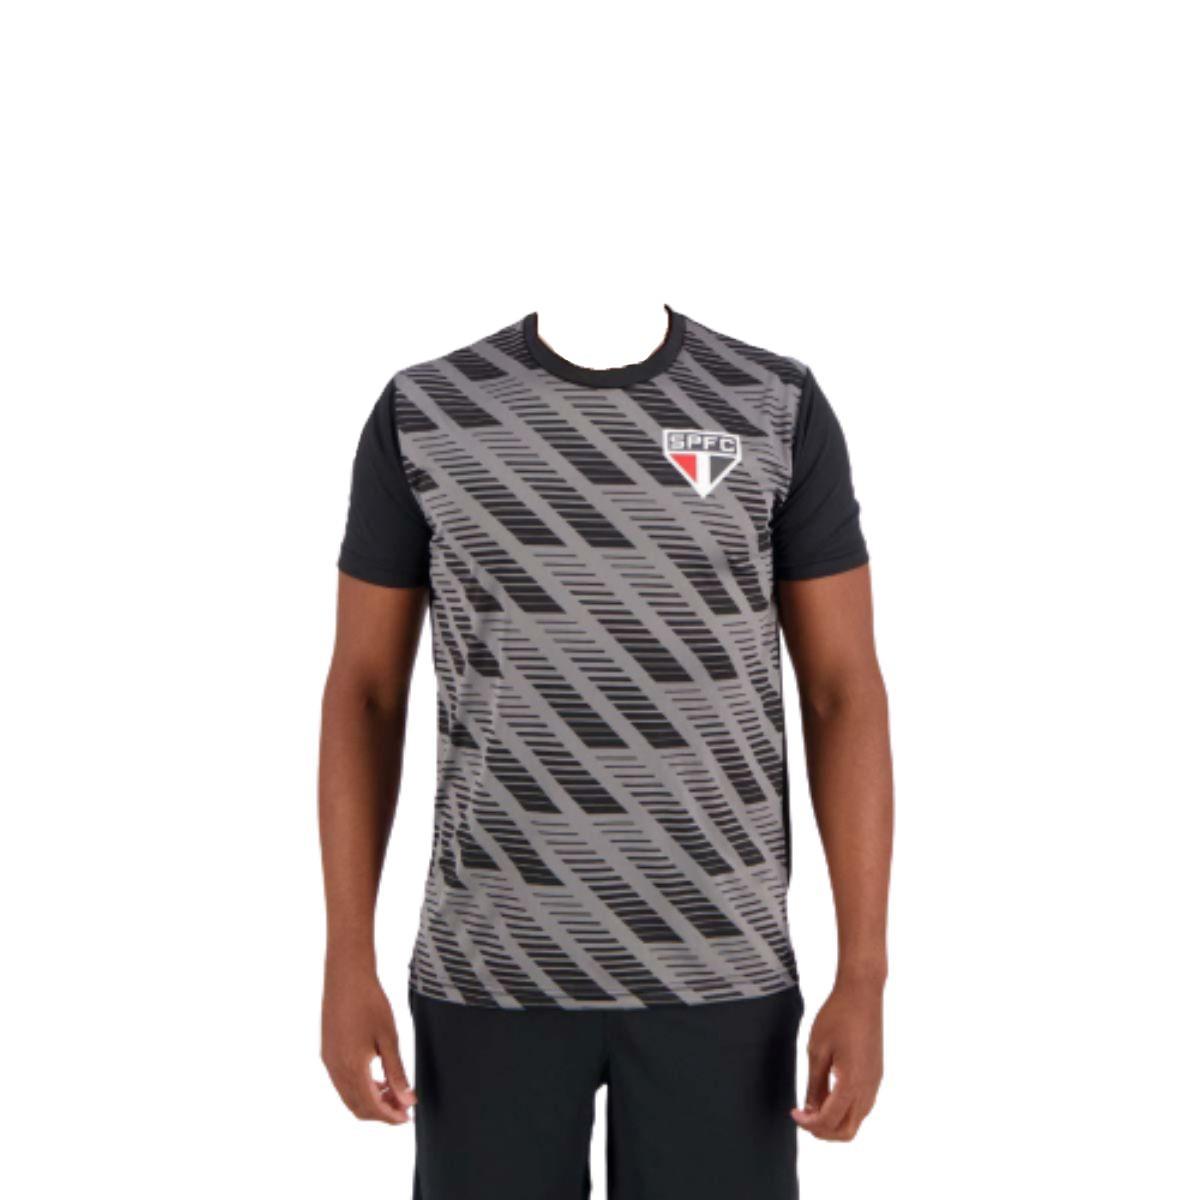 Camiseta SPR São Paulo Rain Preta